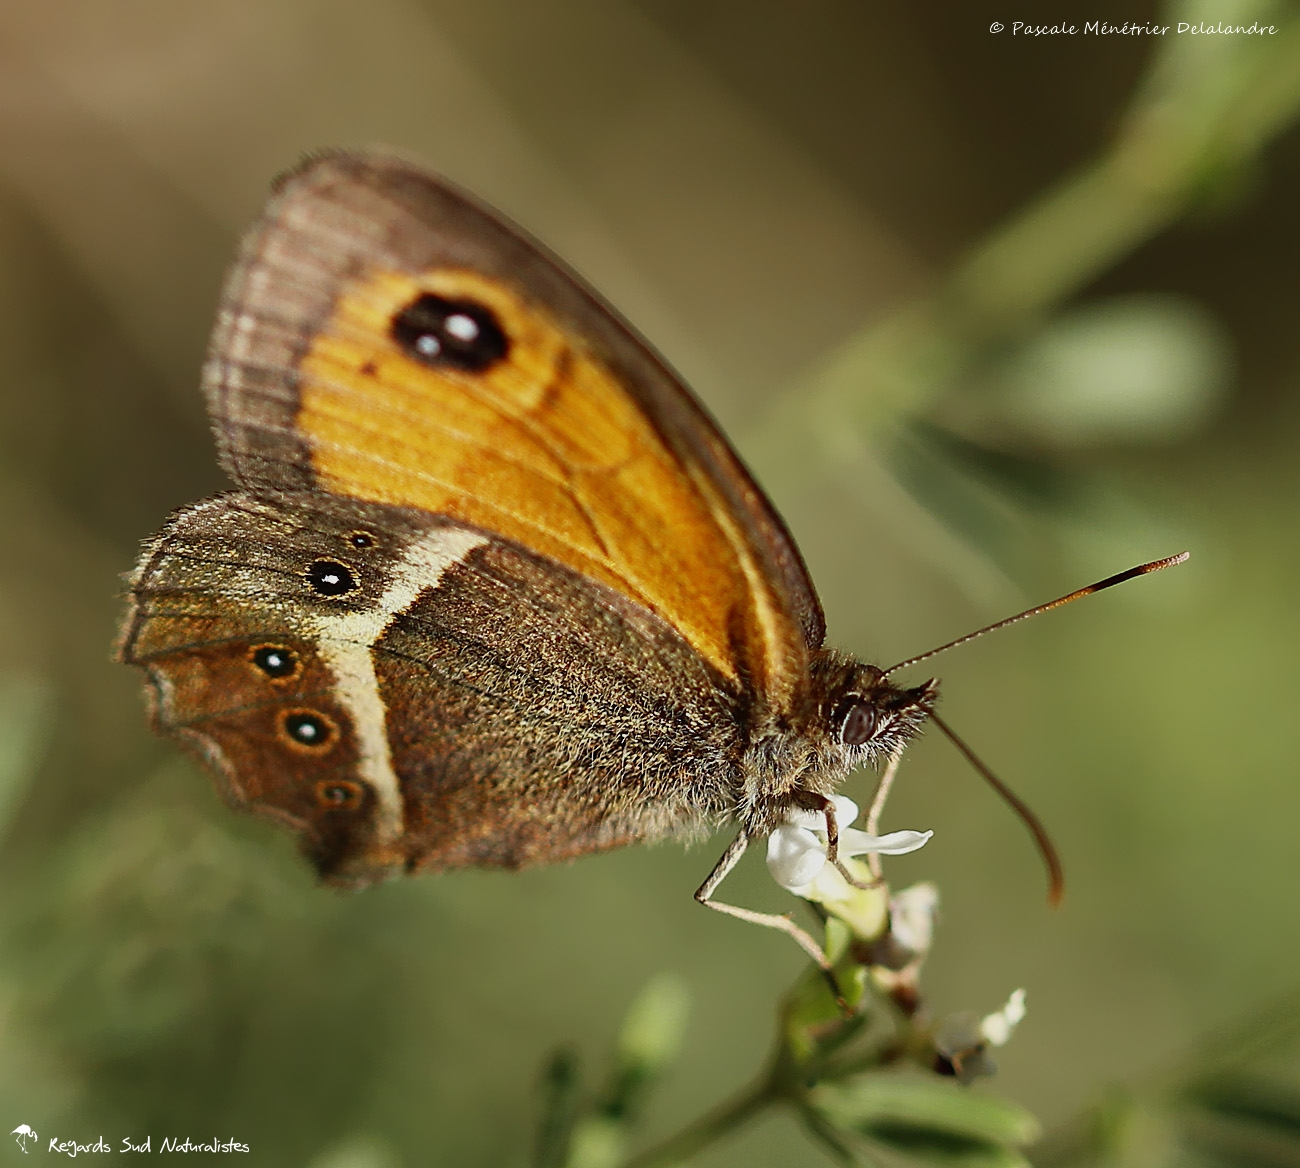 Ocellé rubané ou Tityre ♀ - Pyronia bathseba - Nymphalidae